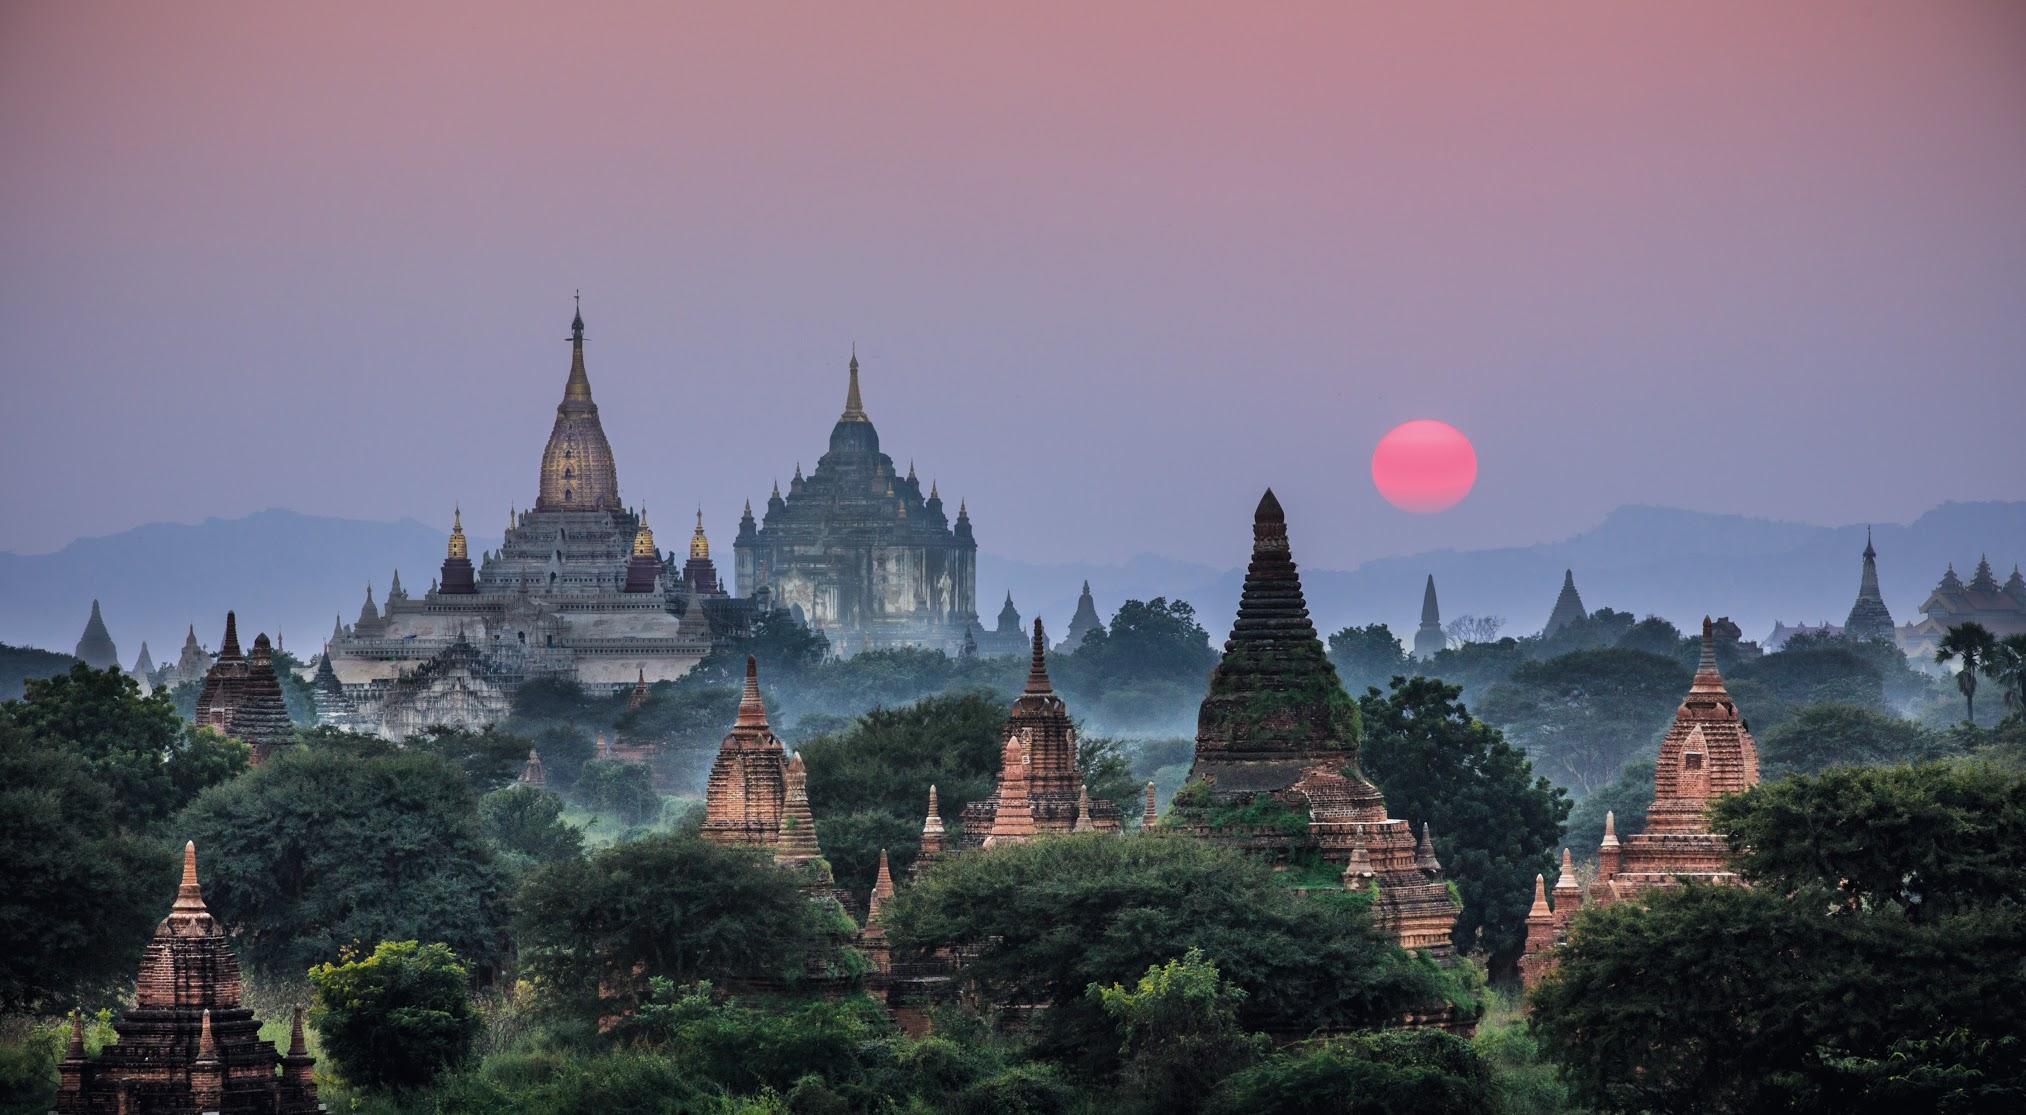 Capturing the Spirit of Burma